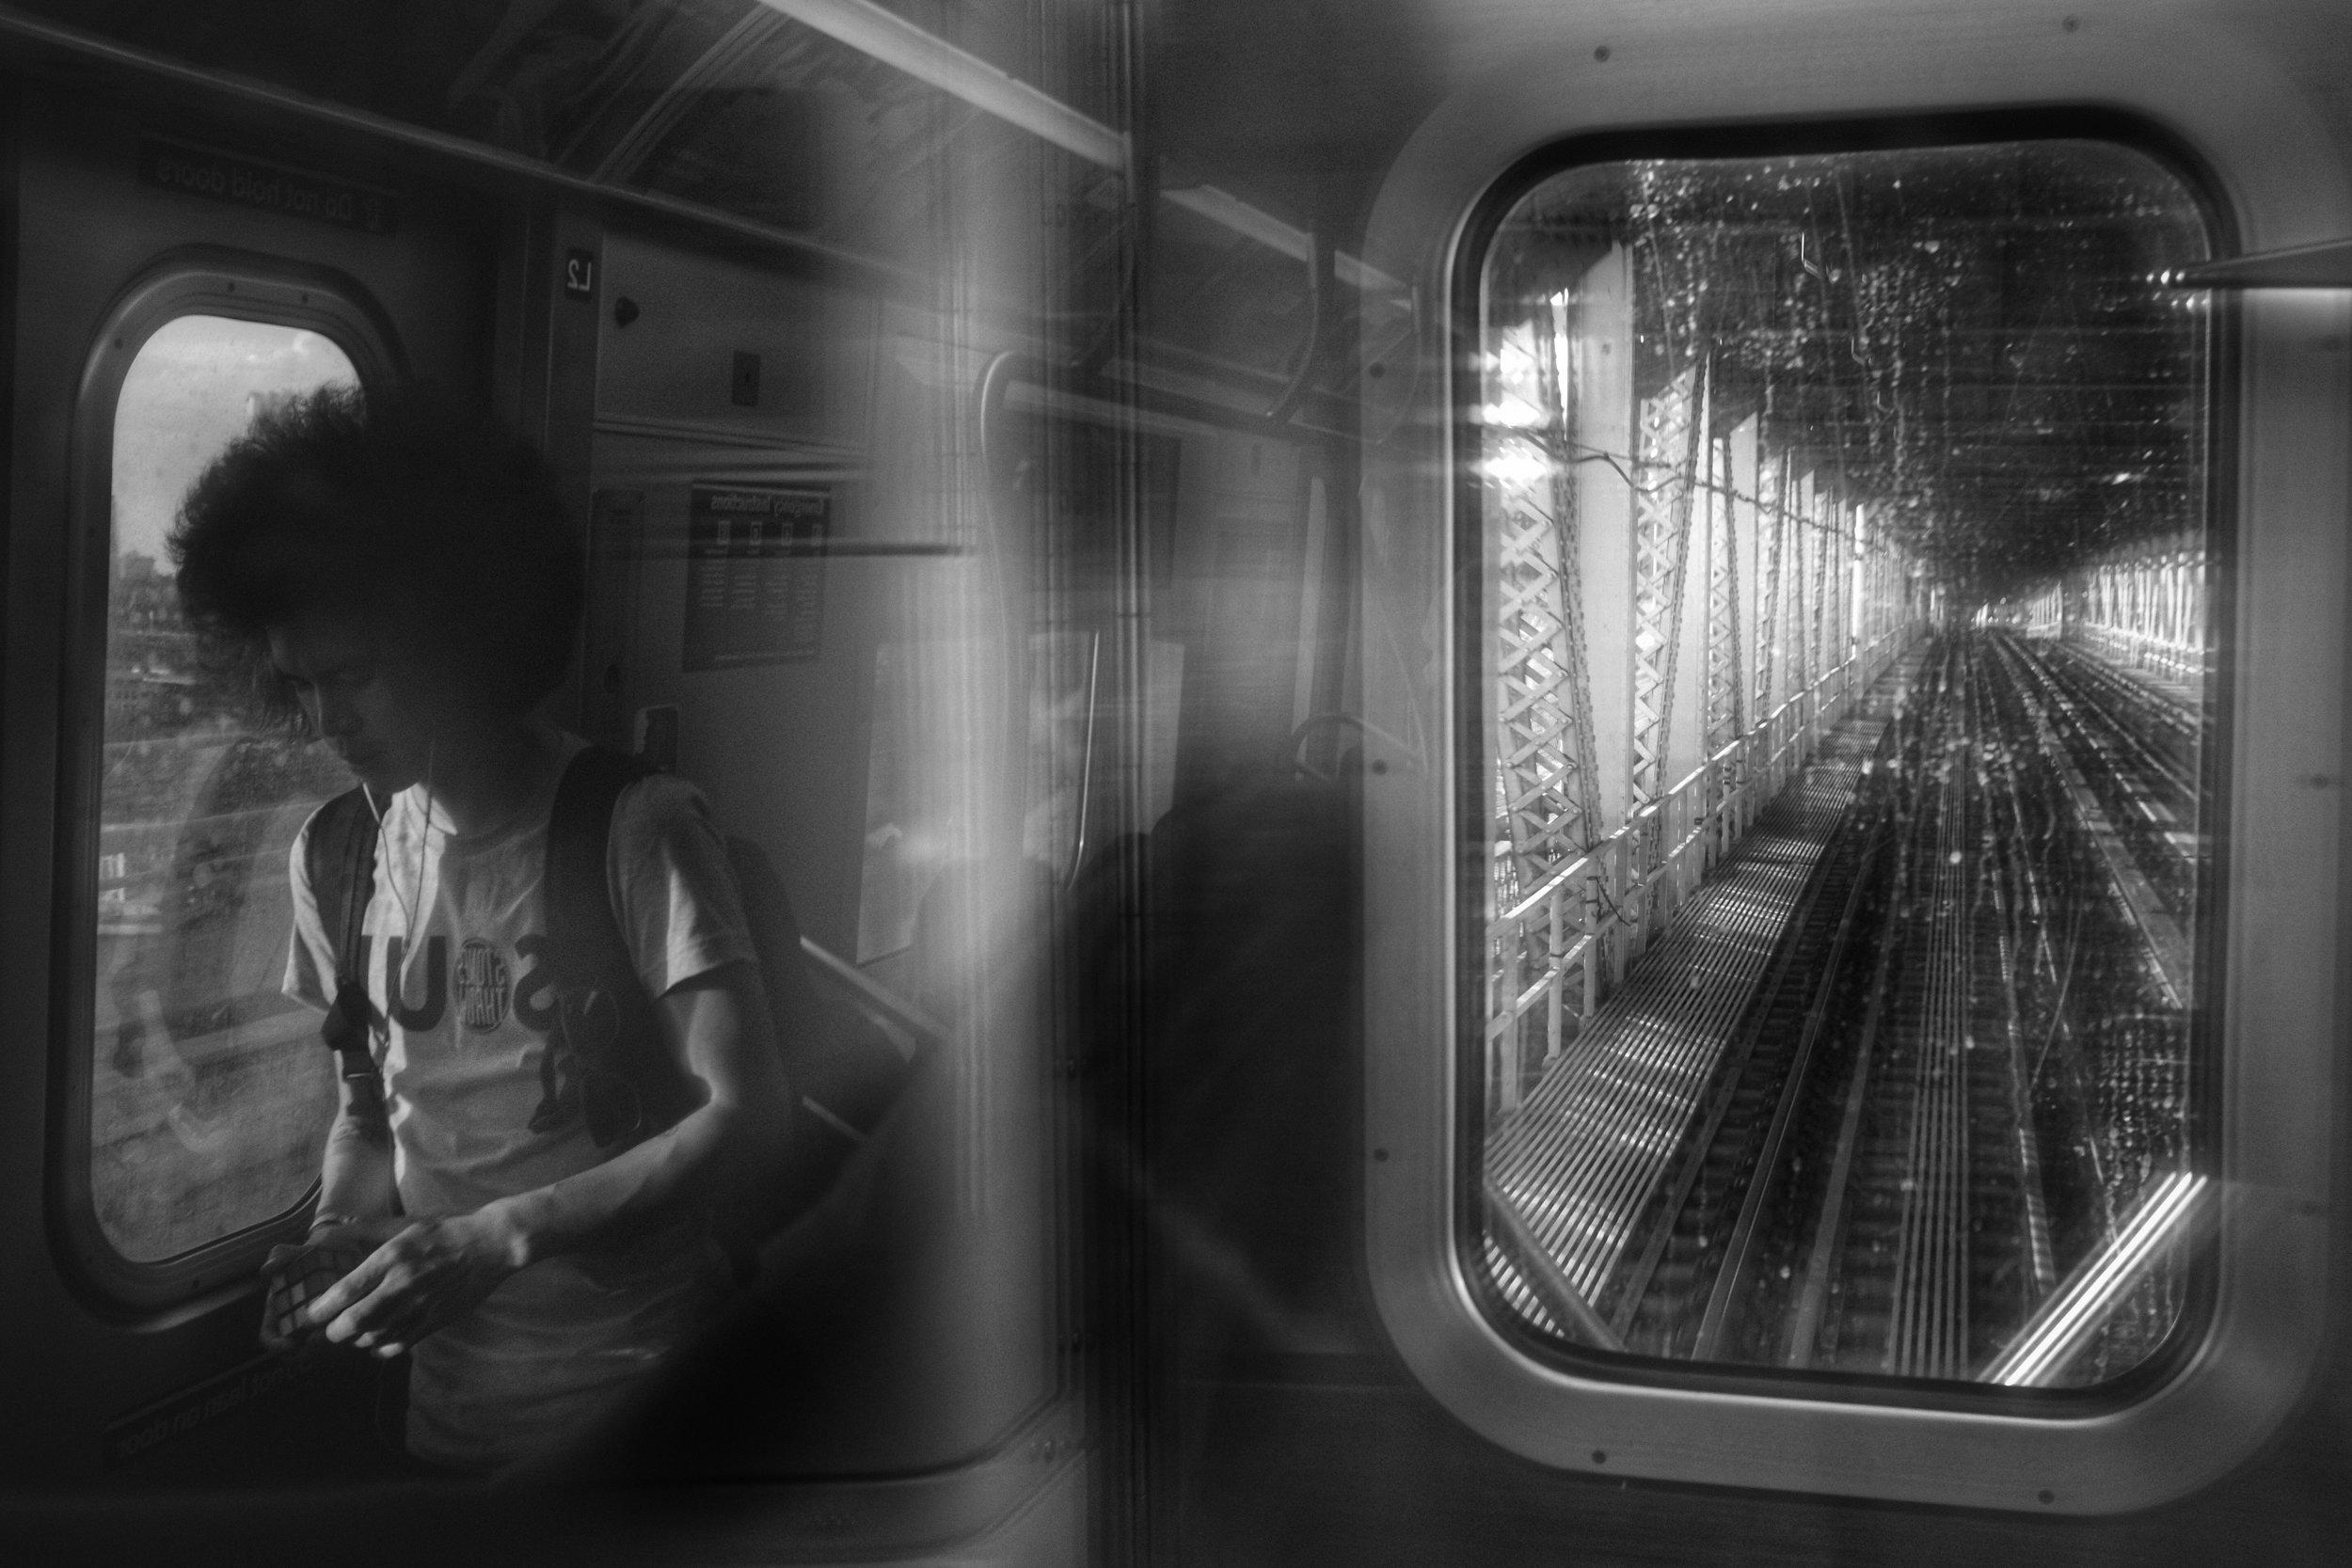 Q Train. Manhattan Bridge. New York City. 2017.